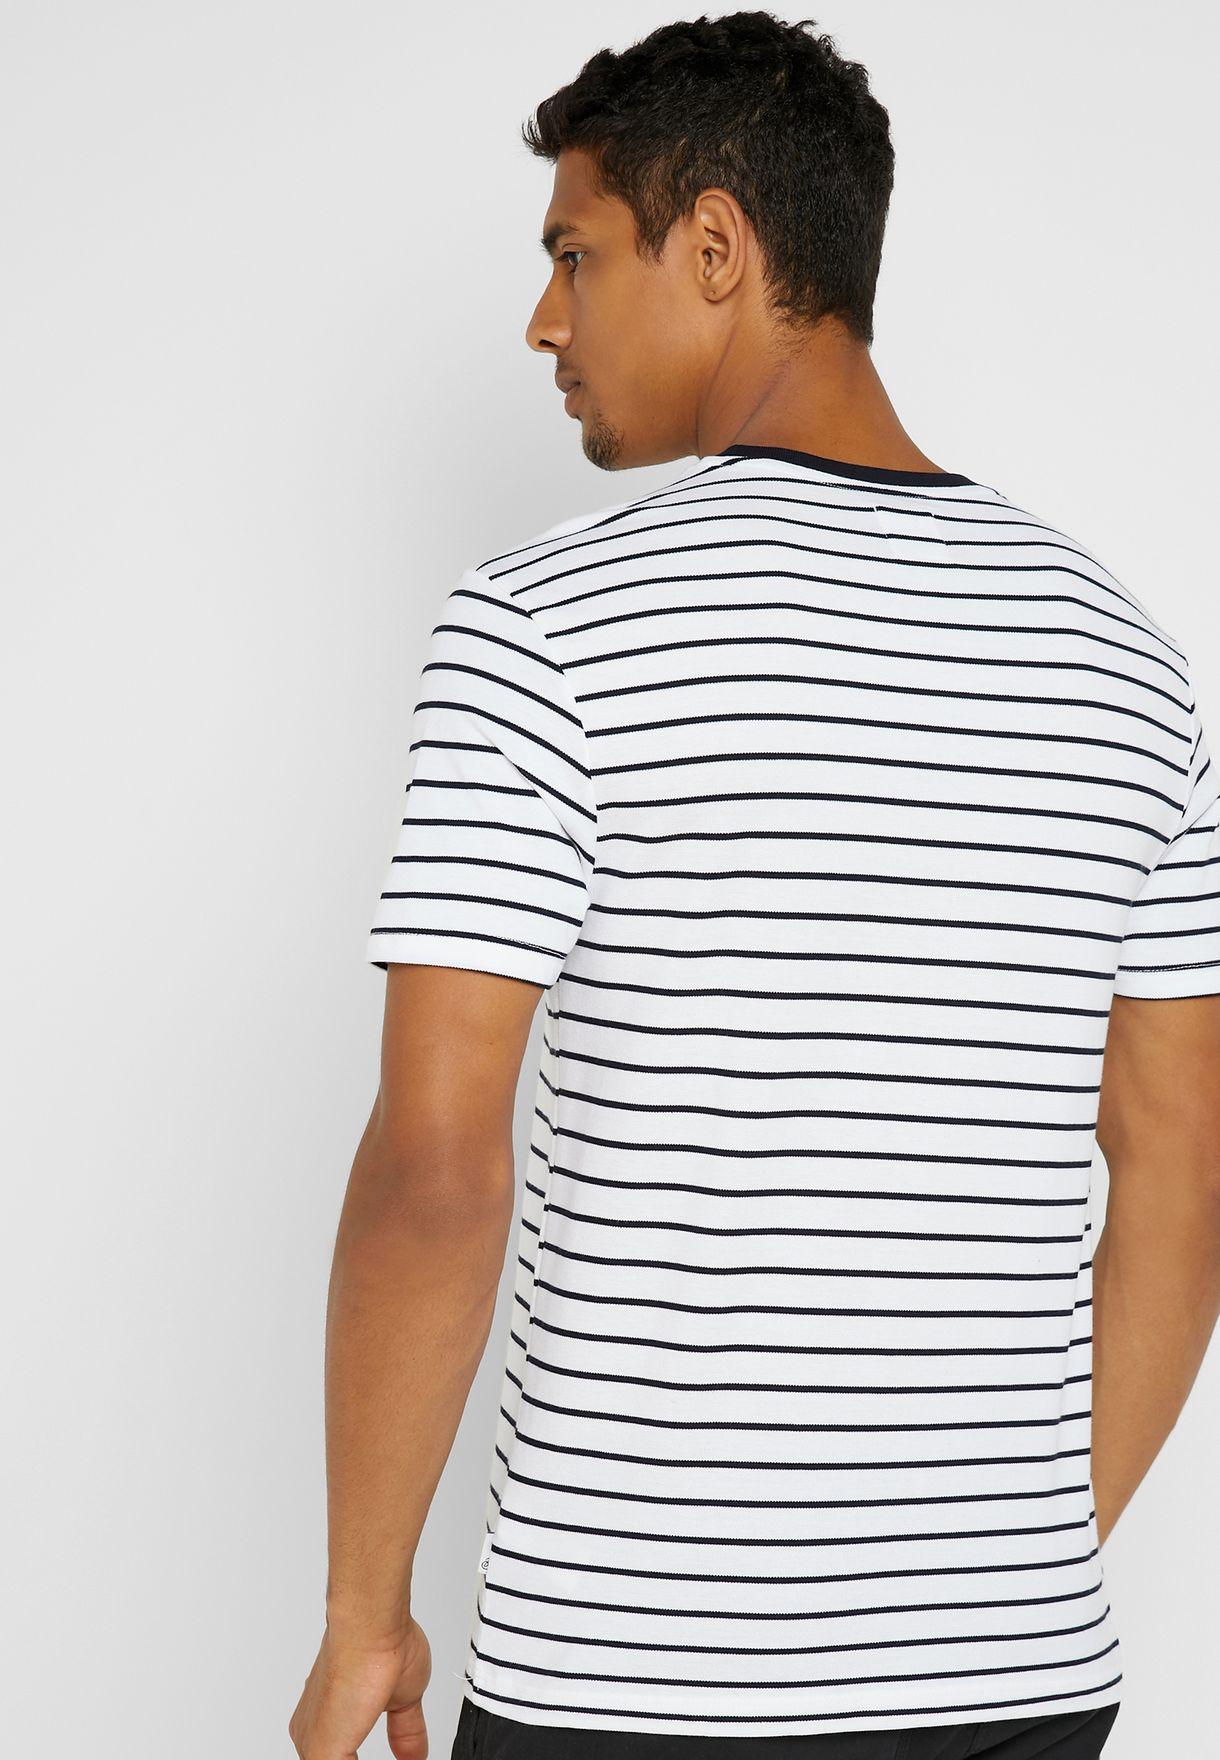 Pique Striped Crew Neck T-Shirt